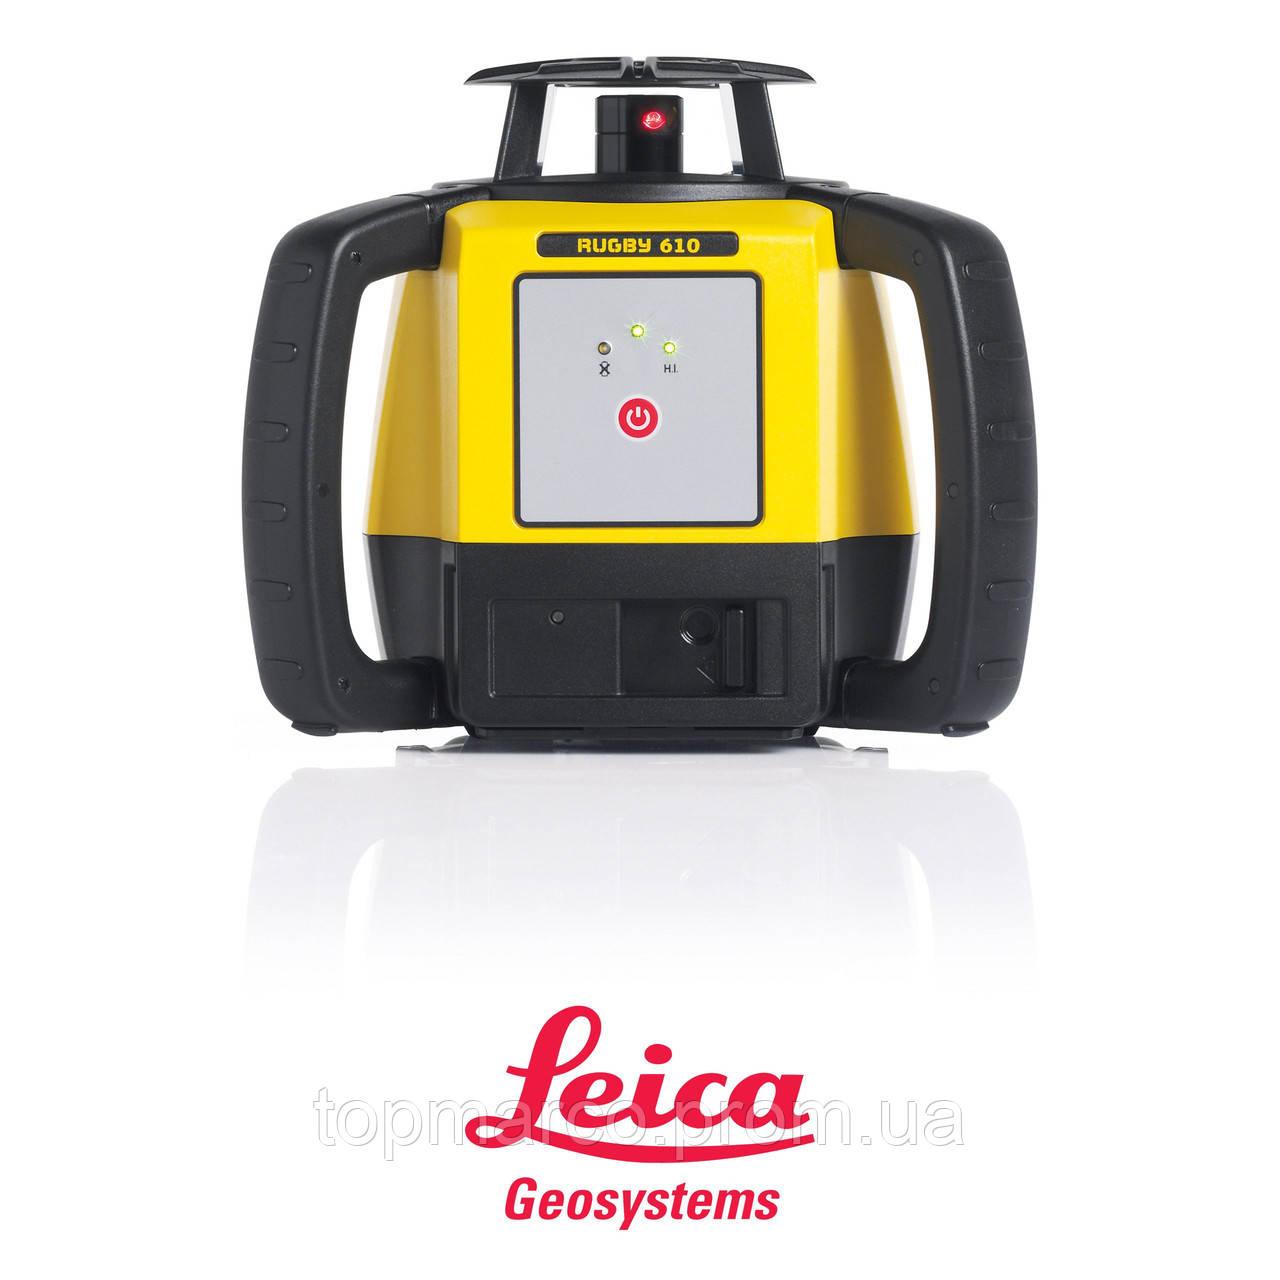 Лазерный нивелир Leica Rugby 610 + батарея